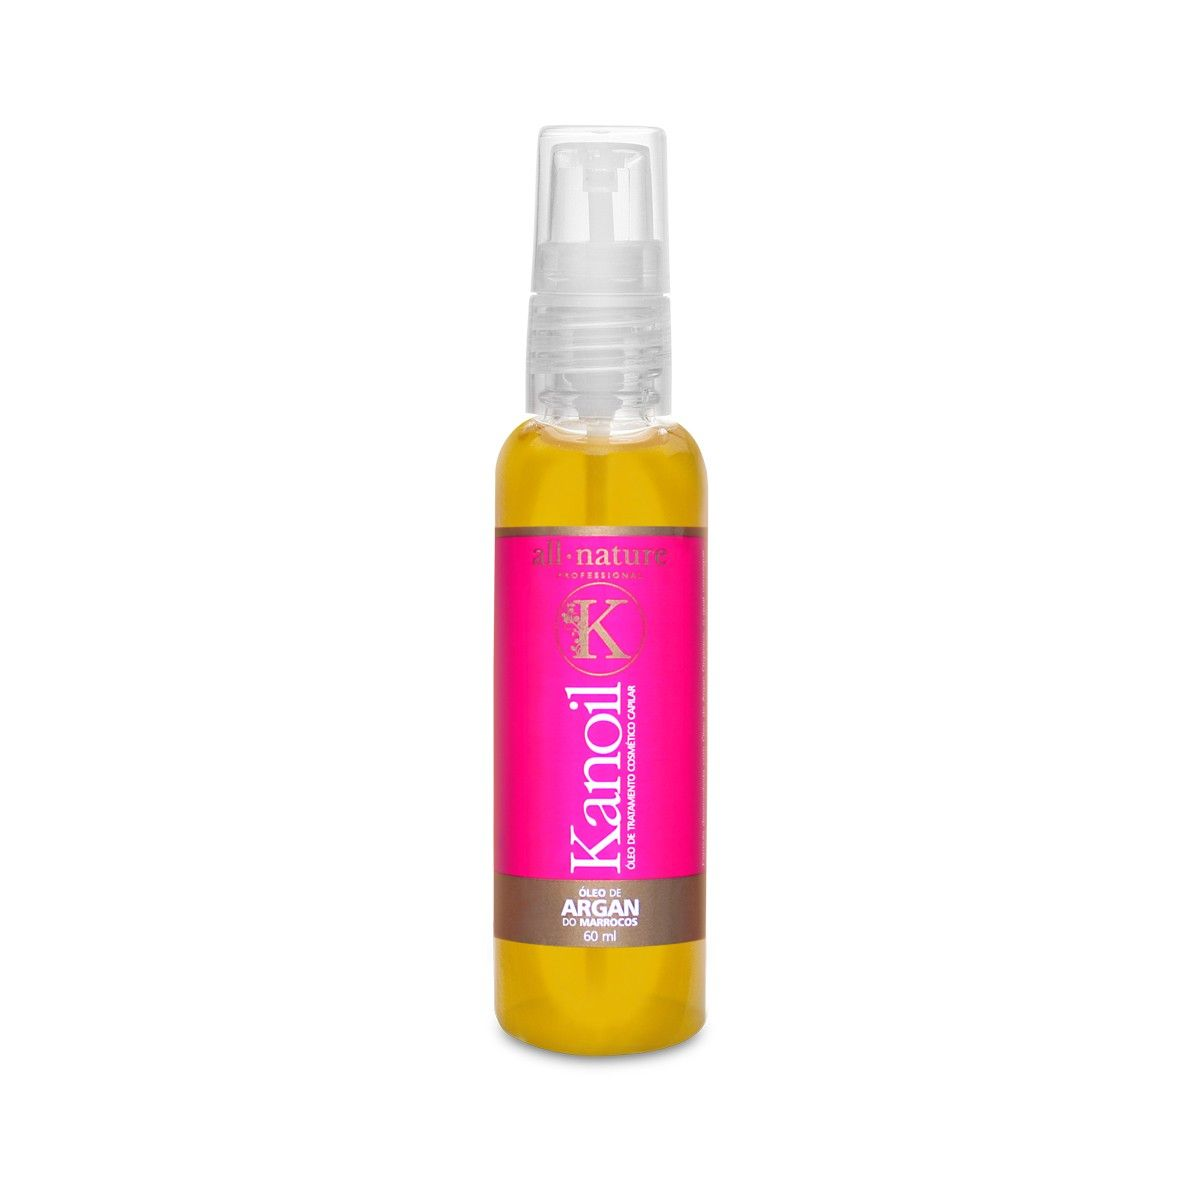 Kit  Shampoo e Condicionador Hidratante Argilotherapy 300ml  + Máscara Argilotherapy com Argila Branca, Tratamento de Alta Performance 500g + Óleo de Argan 60ml - All Nature